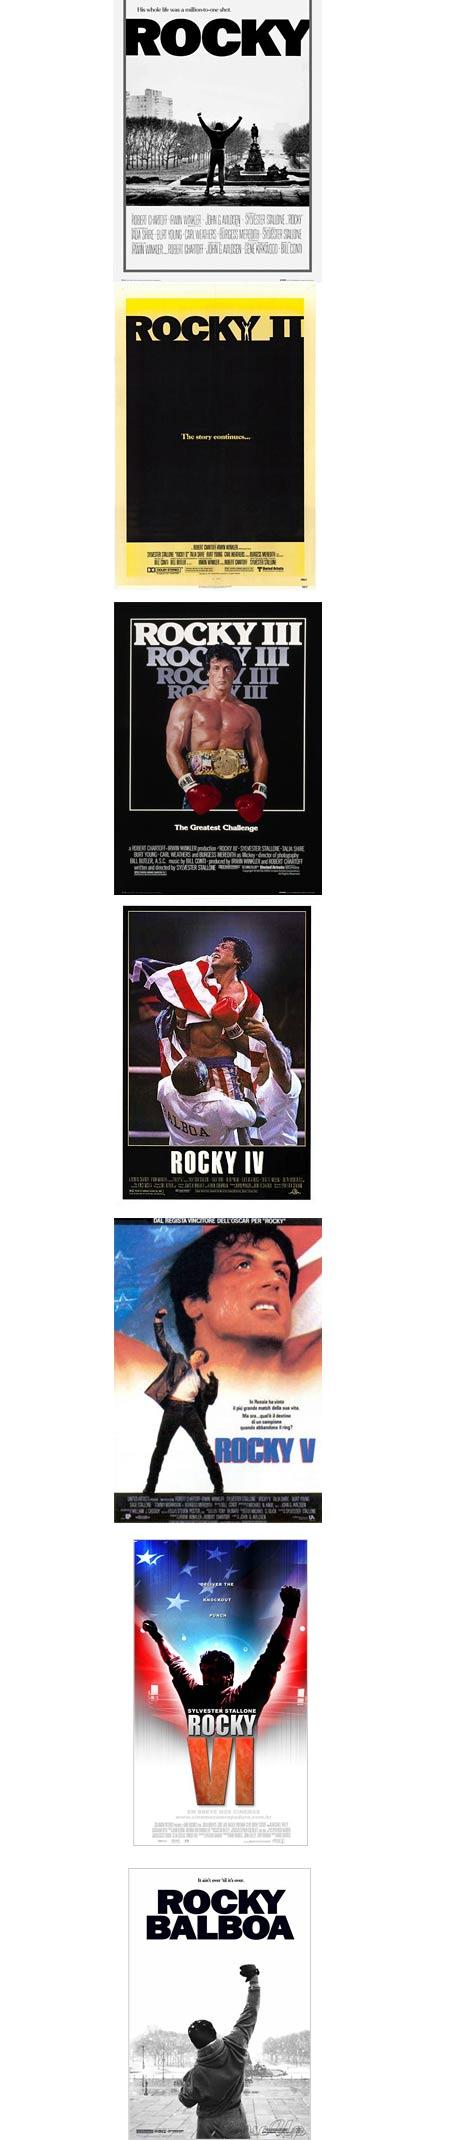 rocky poster geschichte